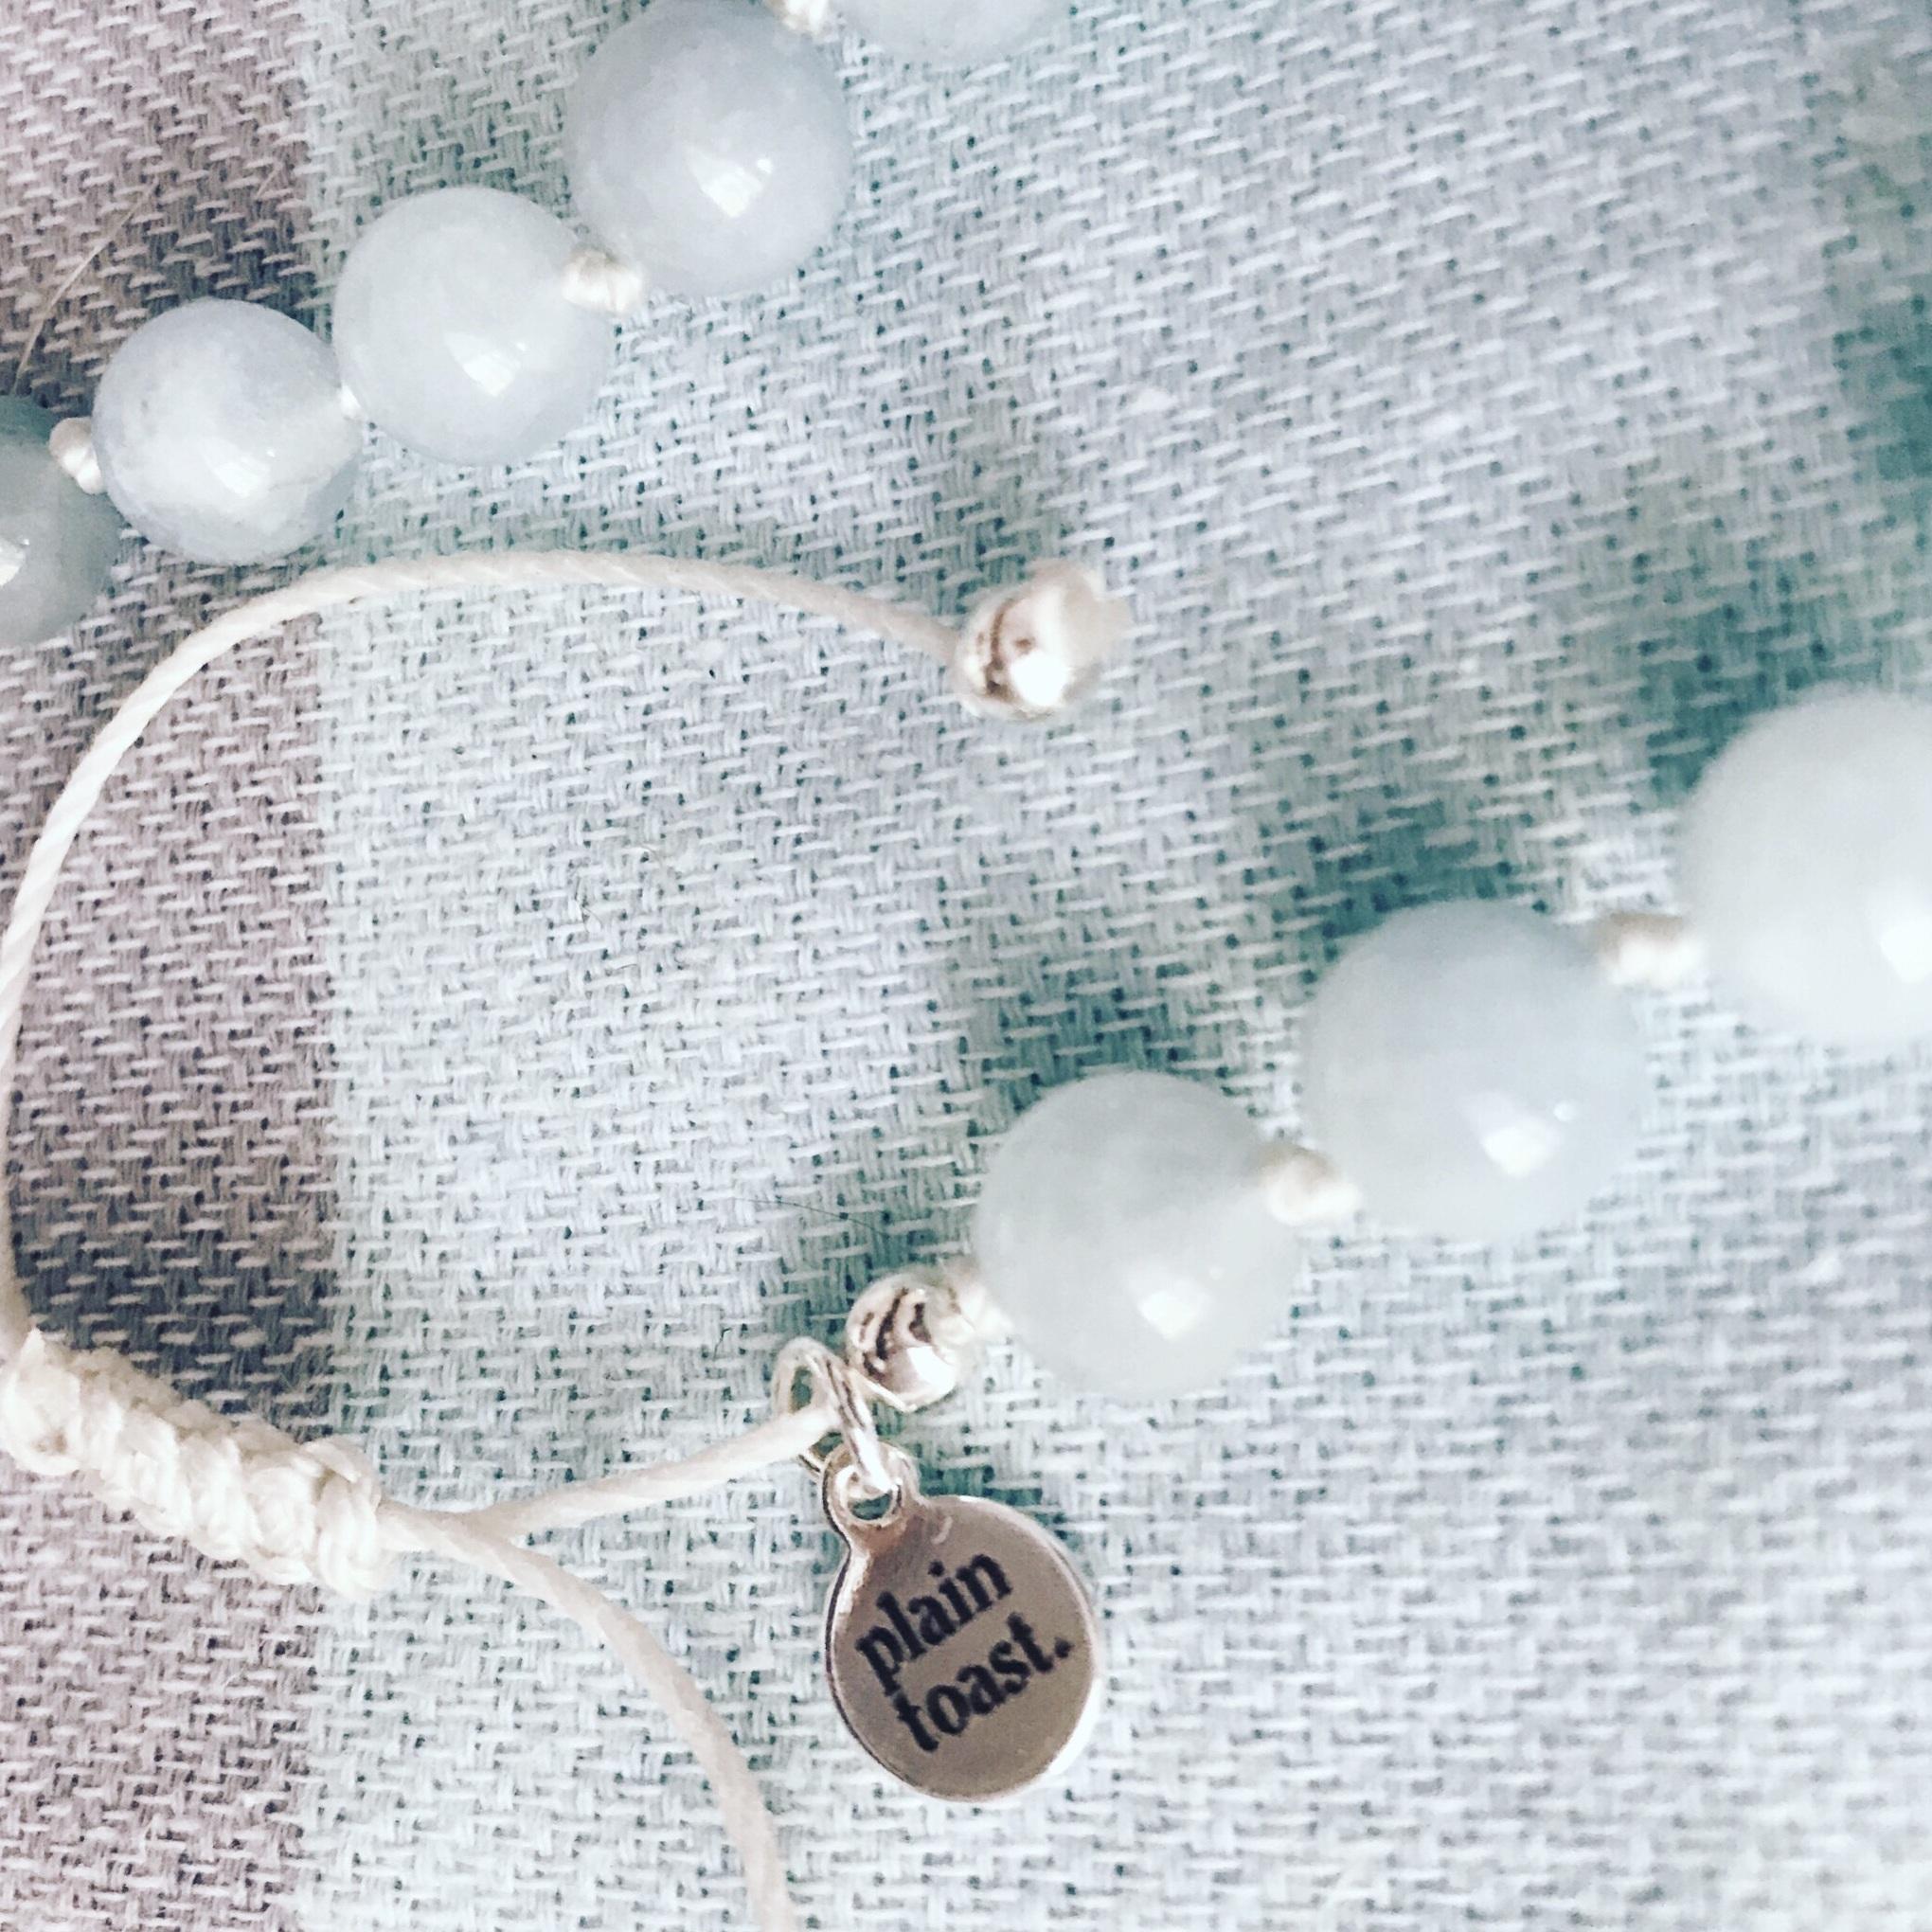 Meditation Mala Beads - COMING SOON